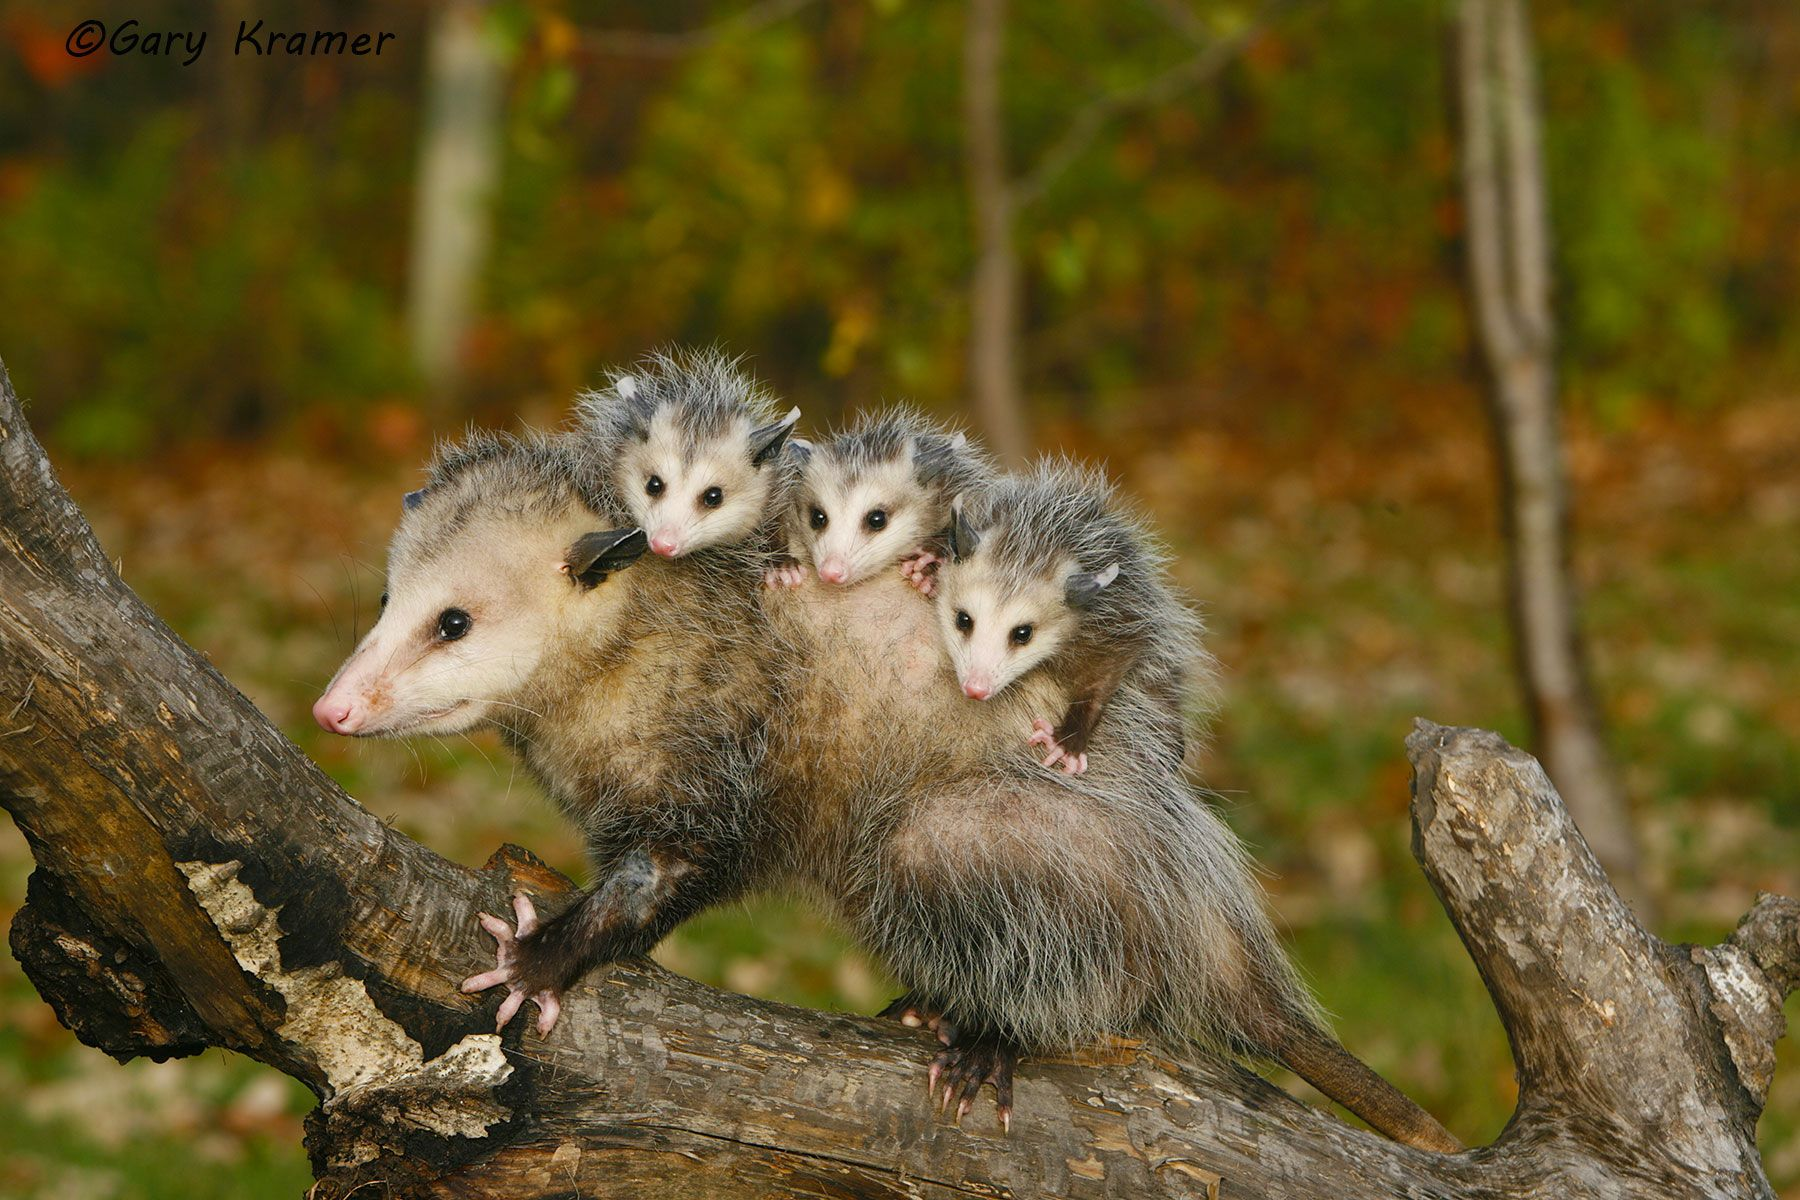 Opossum (Didelphis marsupialis) - NMO#156d